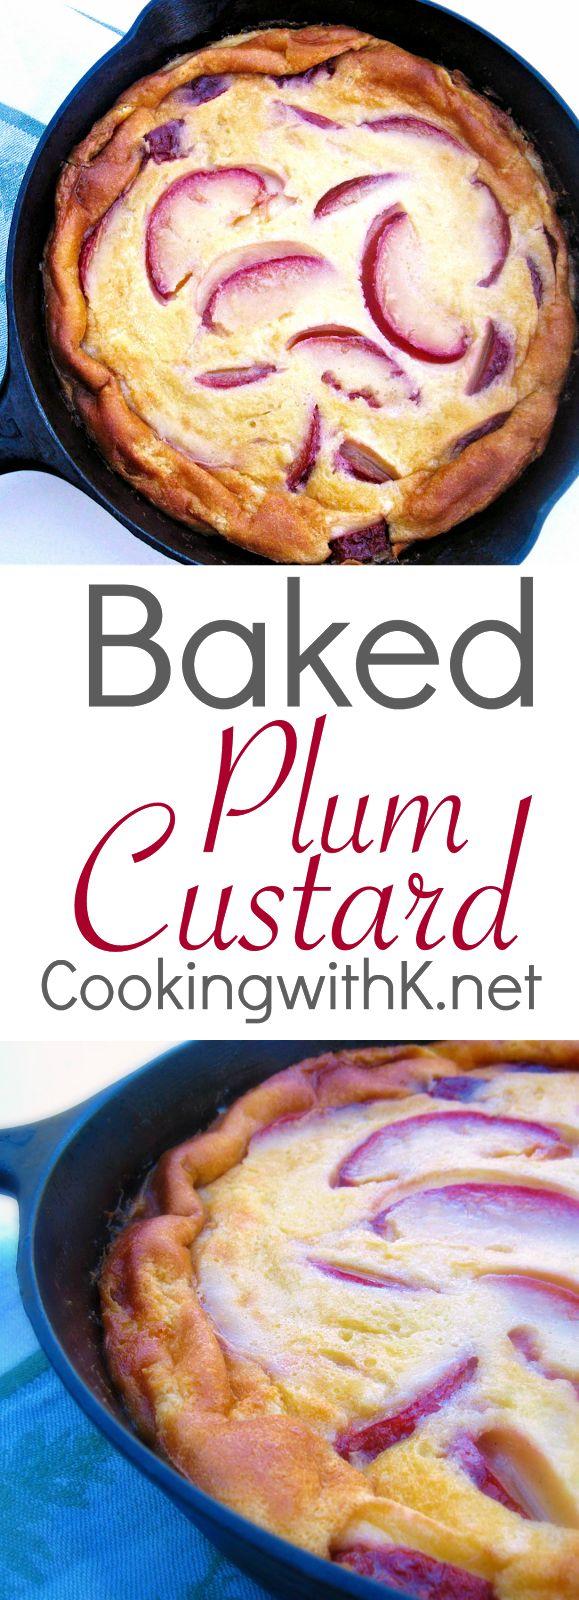 Simple Baked Plum Custard